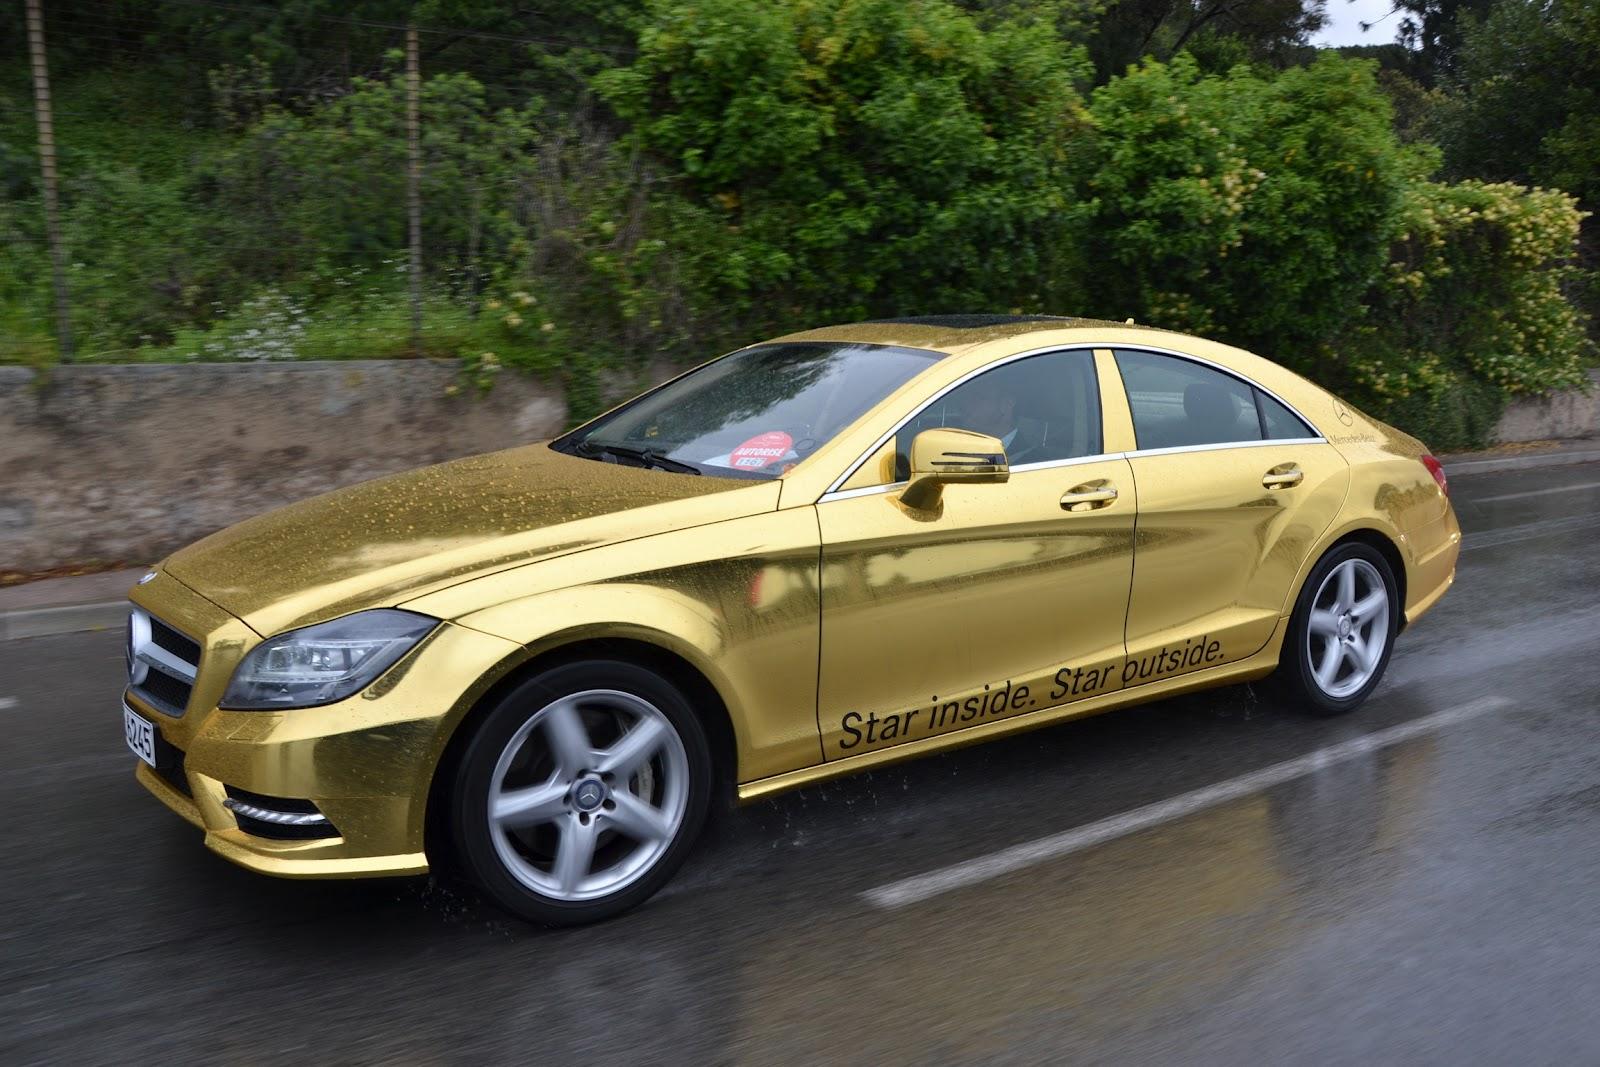 Golden Cars: Mercedes-Benz AMG Gold Car Fleet For Cannes Film Festival